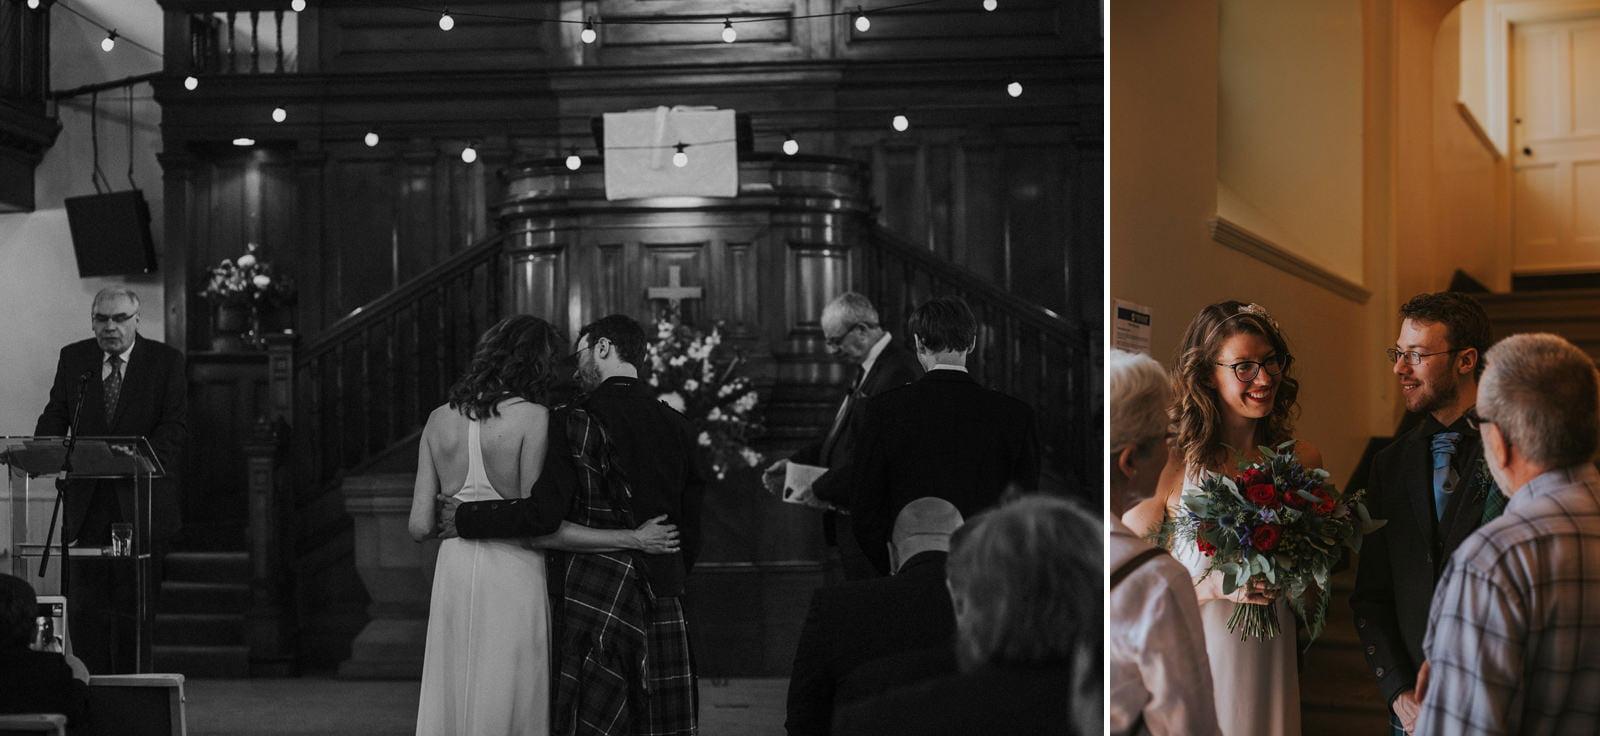 storytelling wedding photography edinburgh